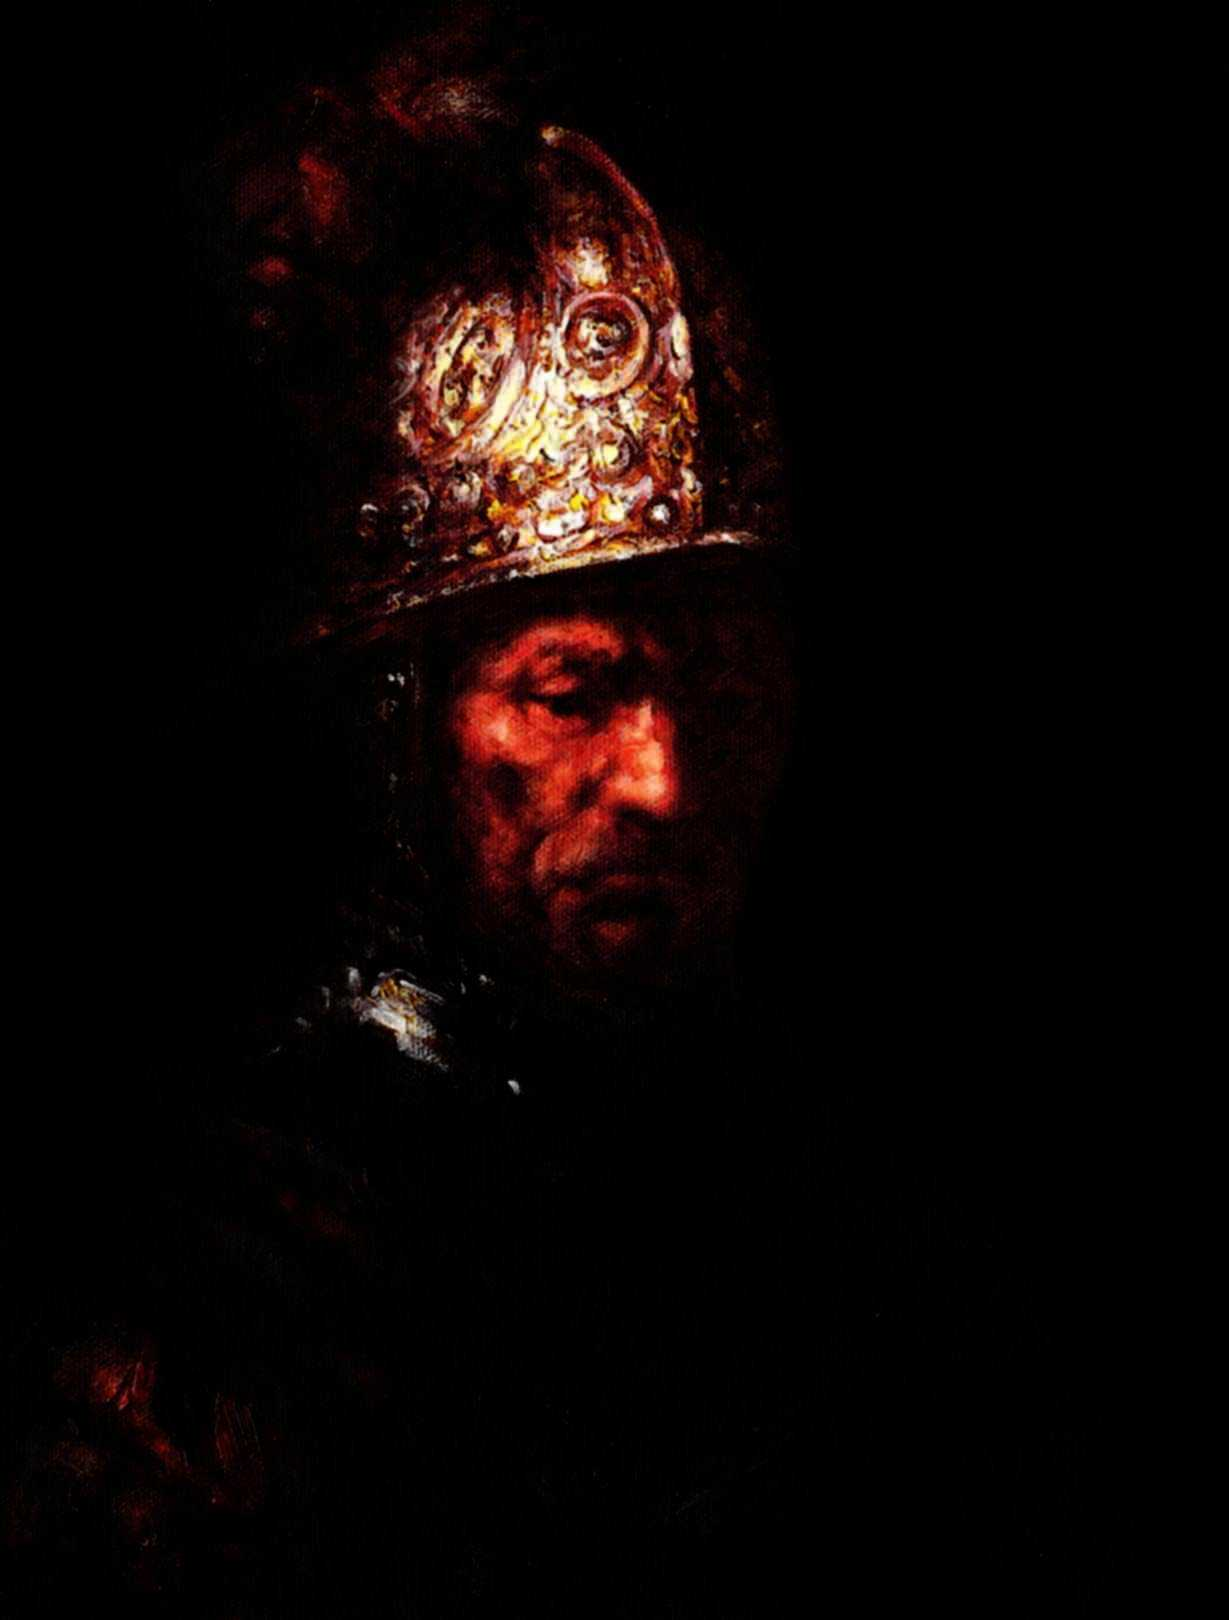 Rembrandt - Mann mit Goldhelm a95982 30x40cm edles Ölgemälde handgemalt Museumsqualität